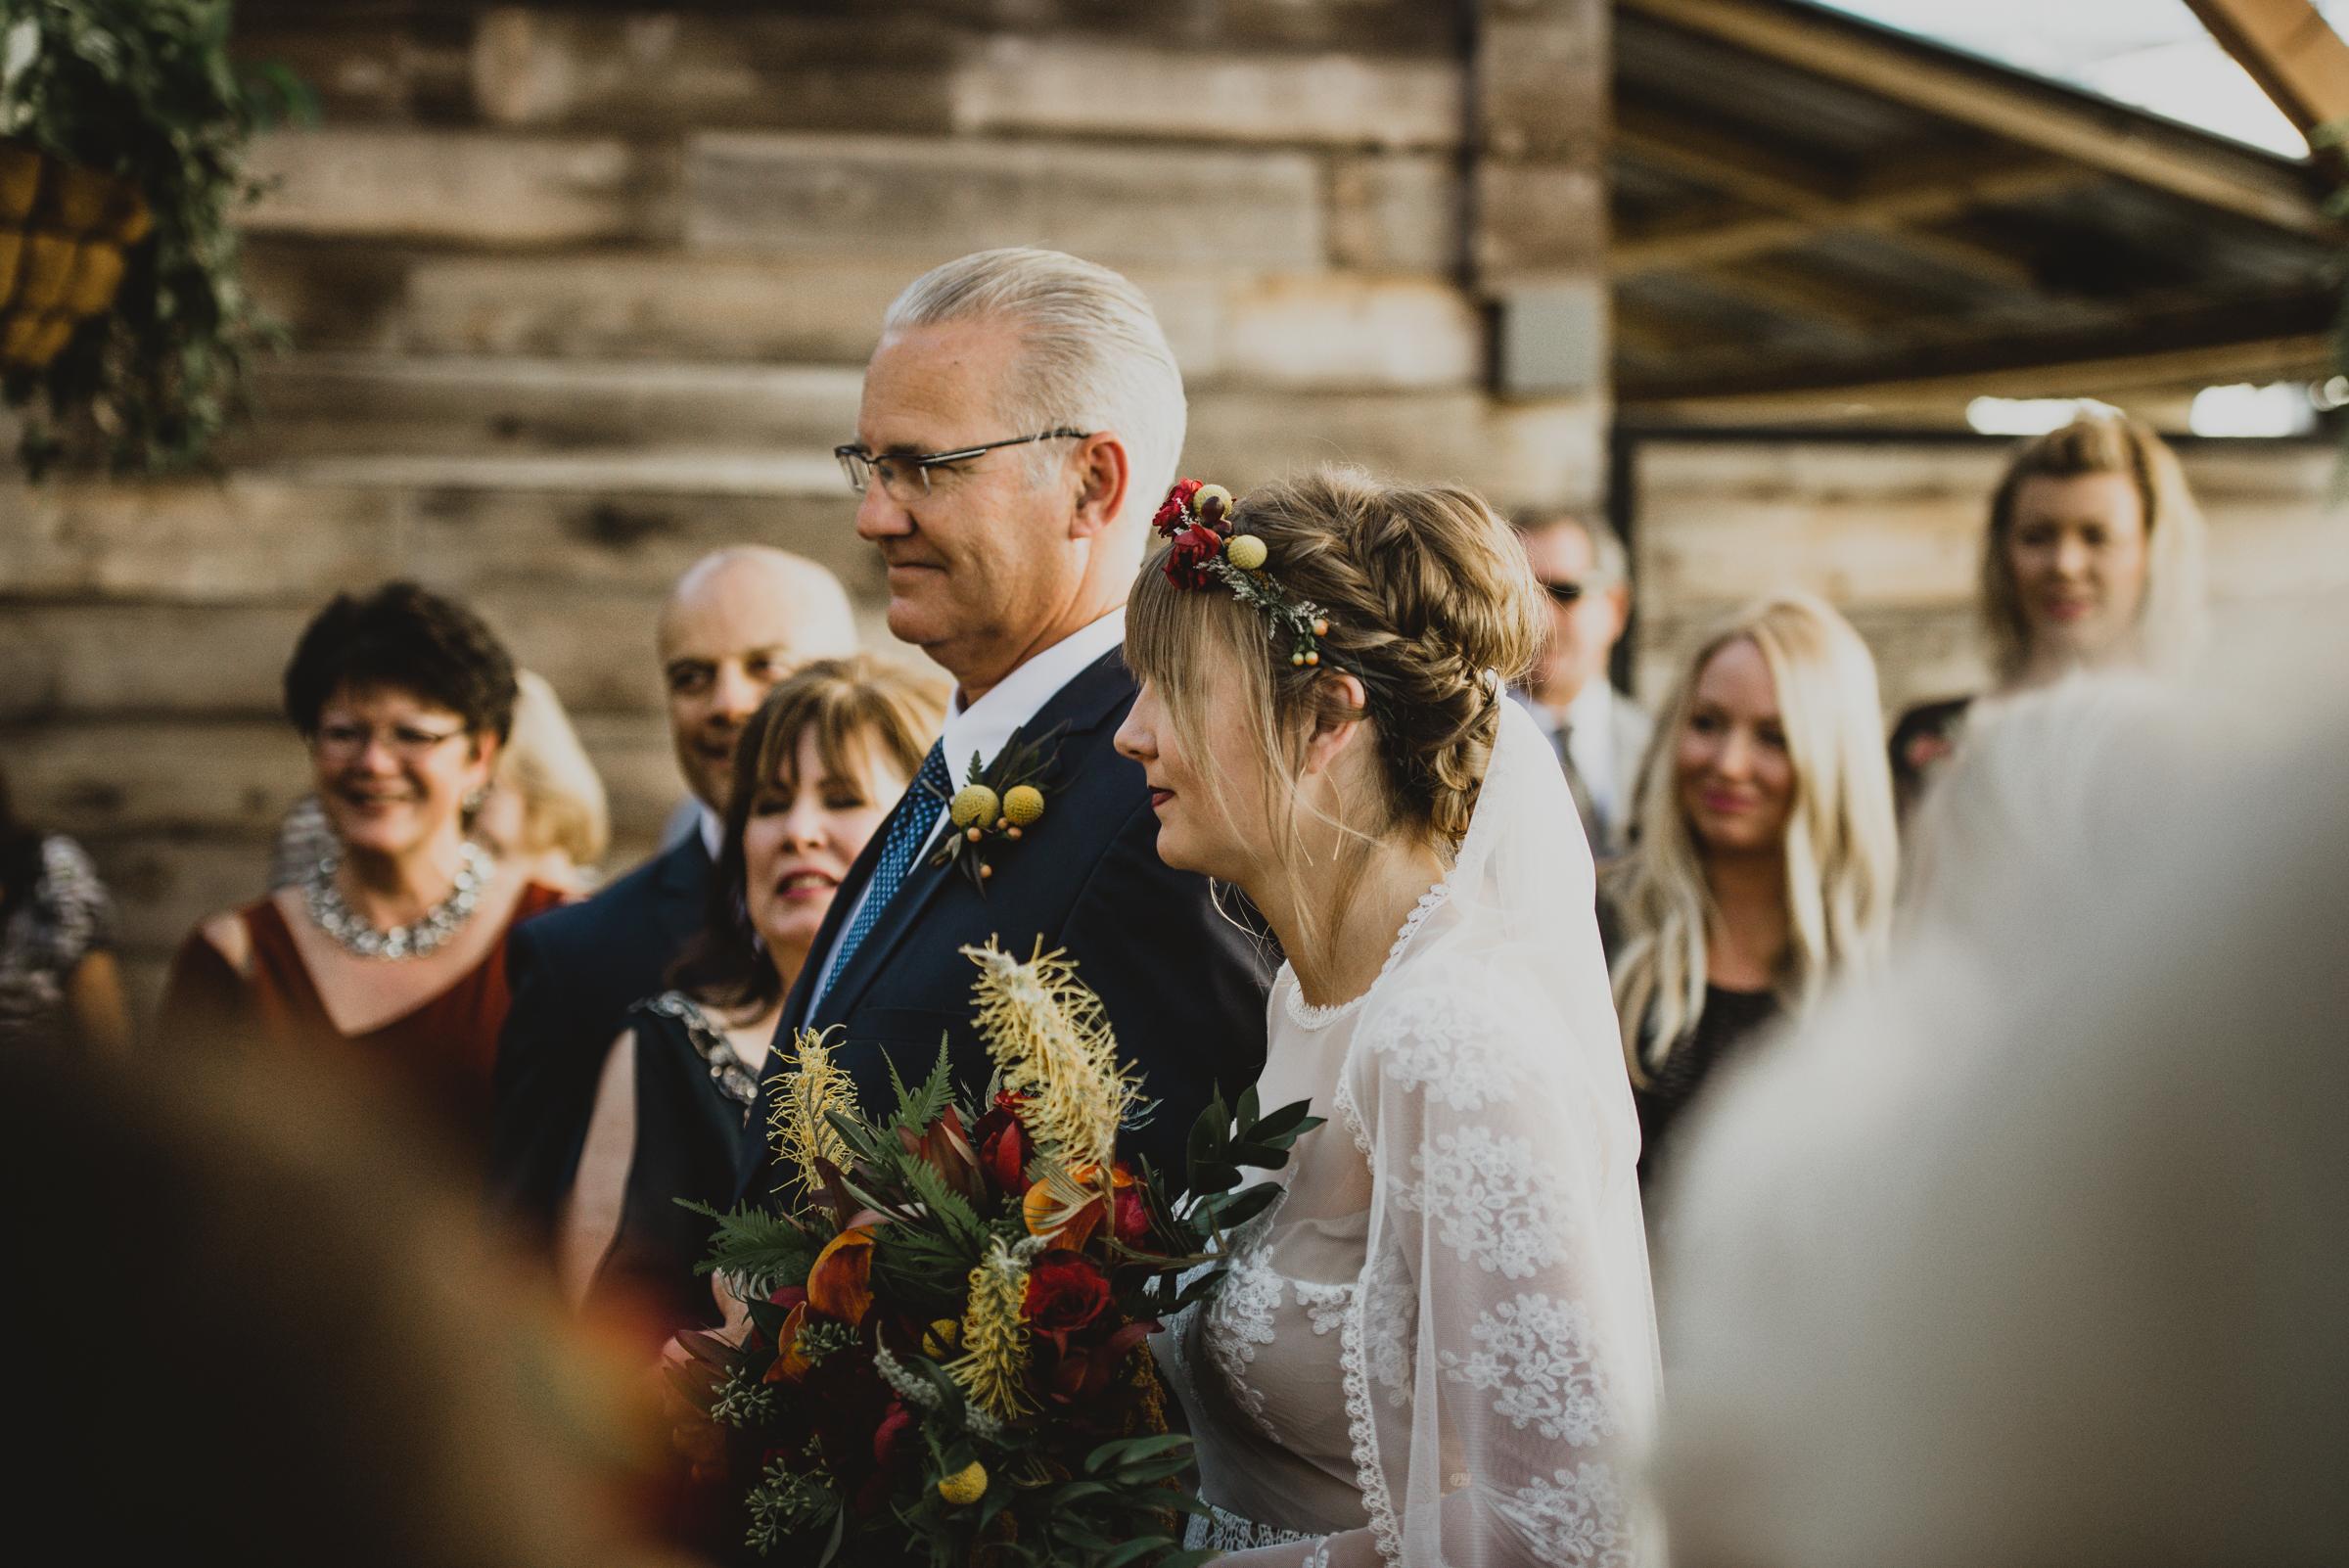 ©Isaiah + Taylor Photography - The Woodshed Booze Brothers Wedding, Vista California Wedding Photographer-65.jpg